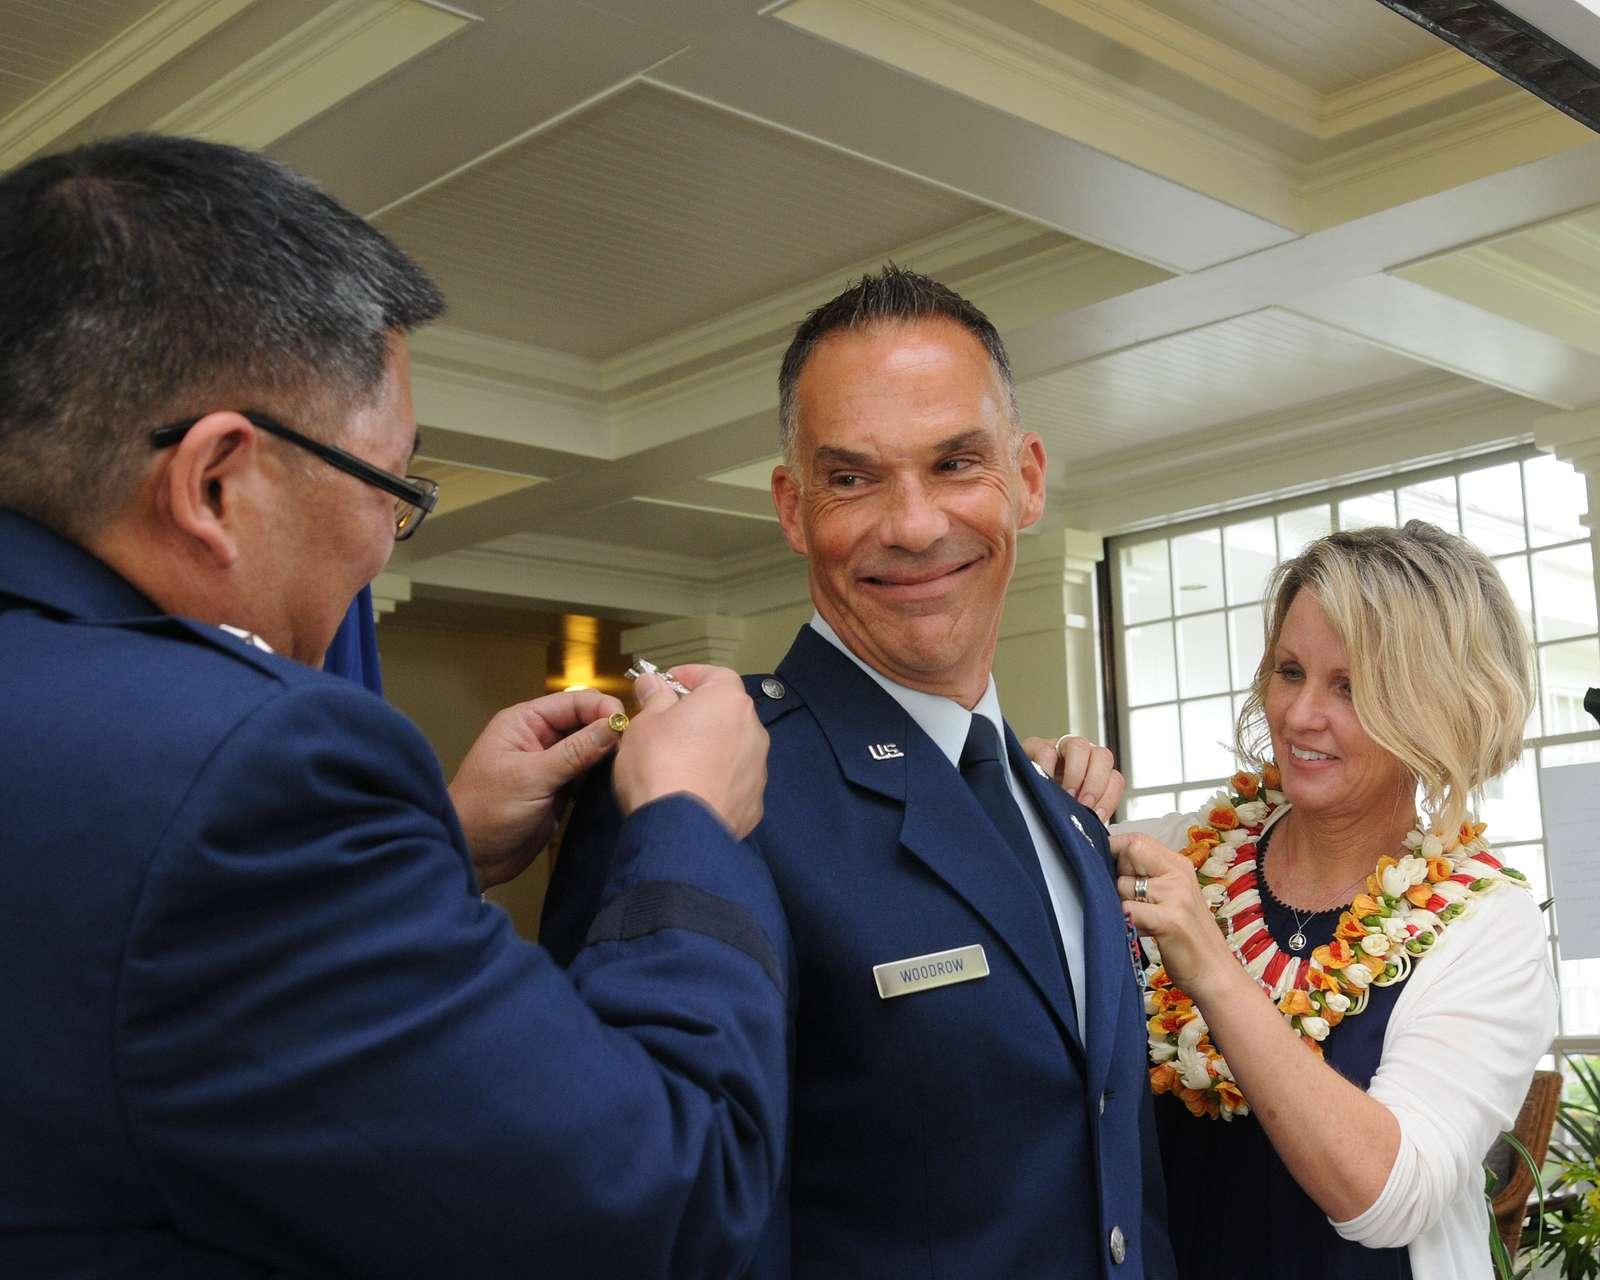 Air Force Brig. Gen. Gregory S. Woodrow is pinned on